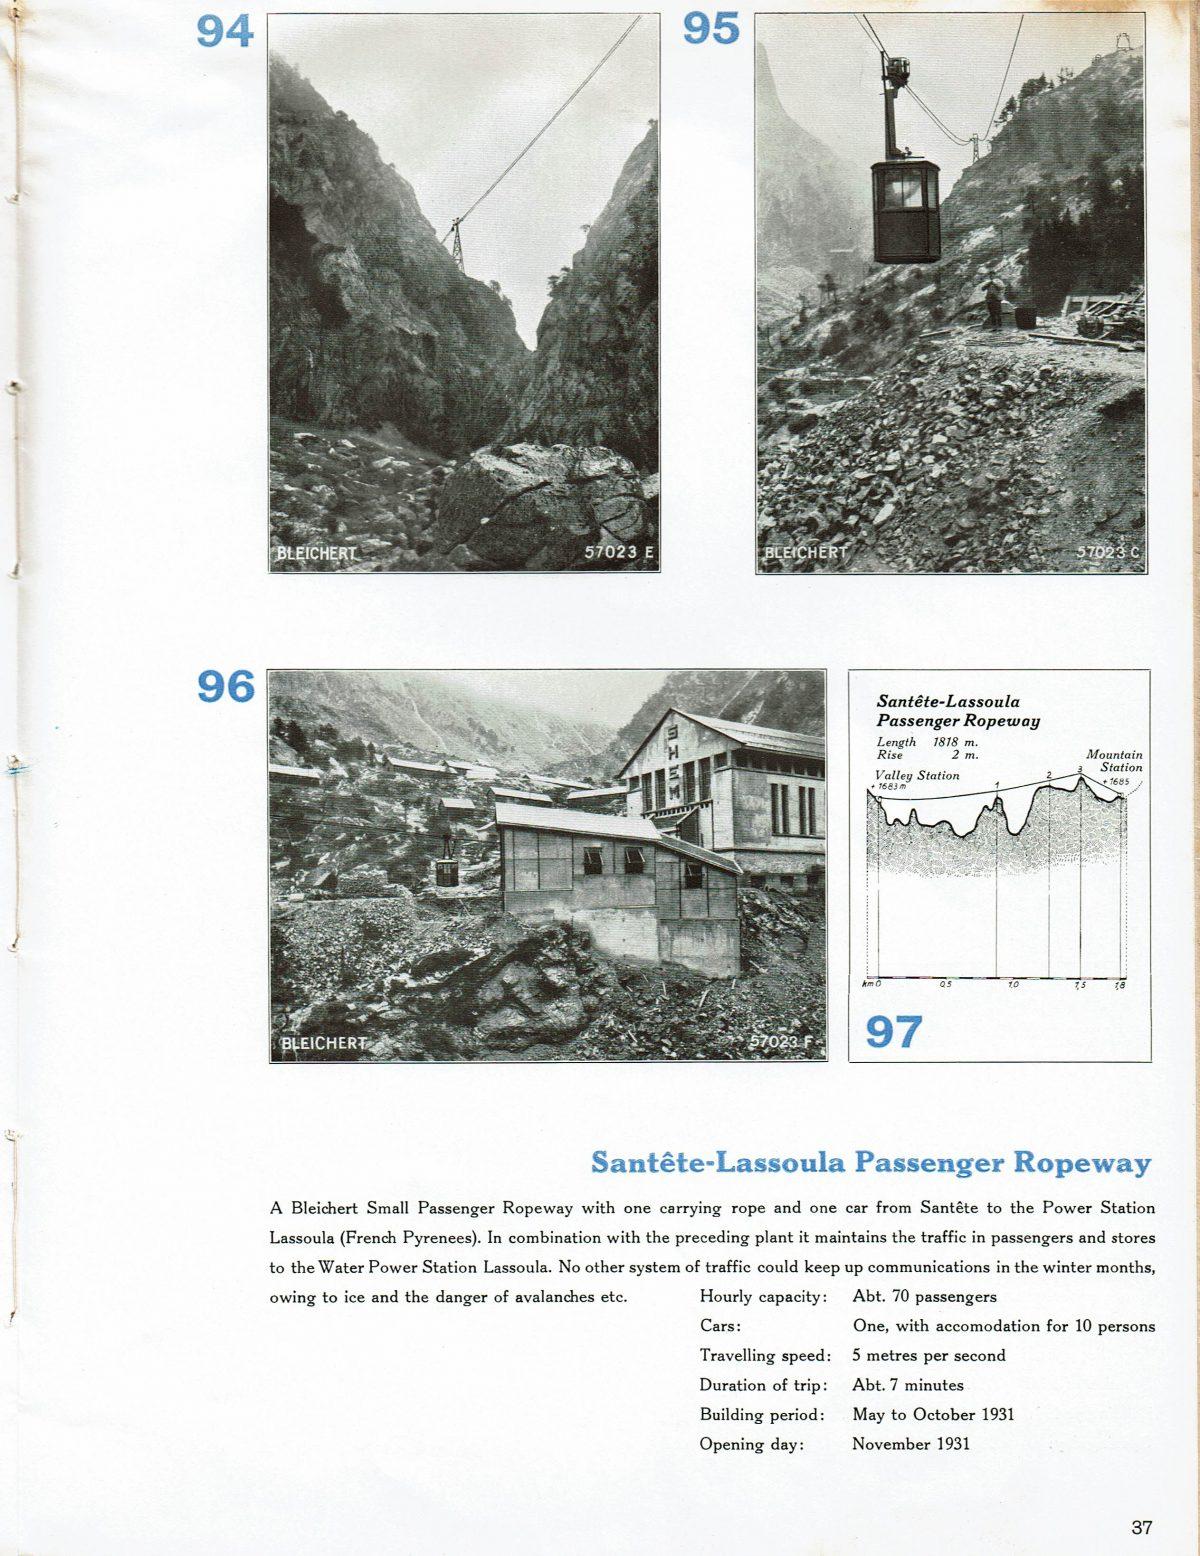 1933 Bleichert Passenger Arial Ropeways 32